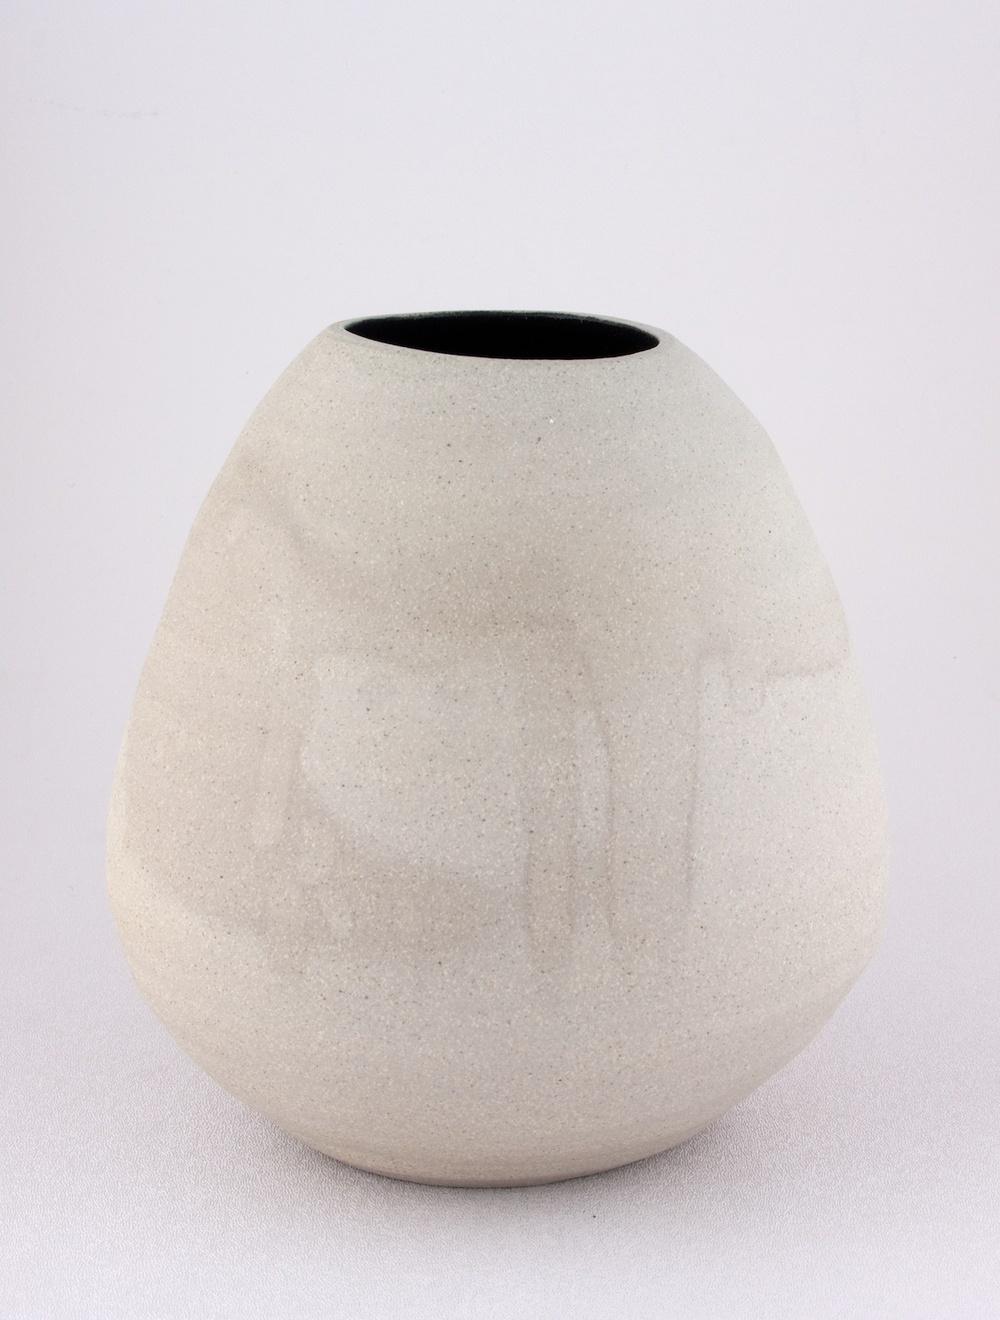 Shio Kusaka  Untitled (grey and black)  2009 Stoneware 8h x 8w in K062